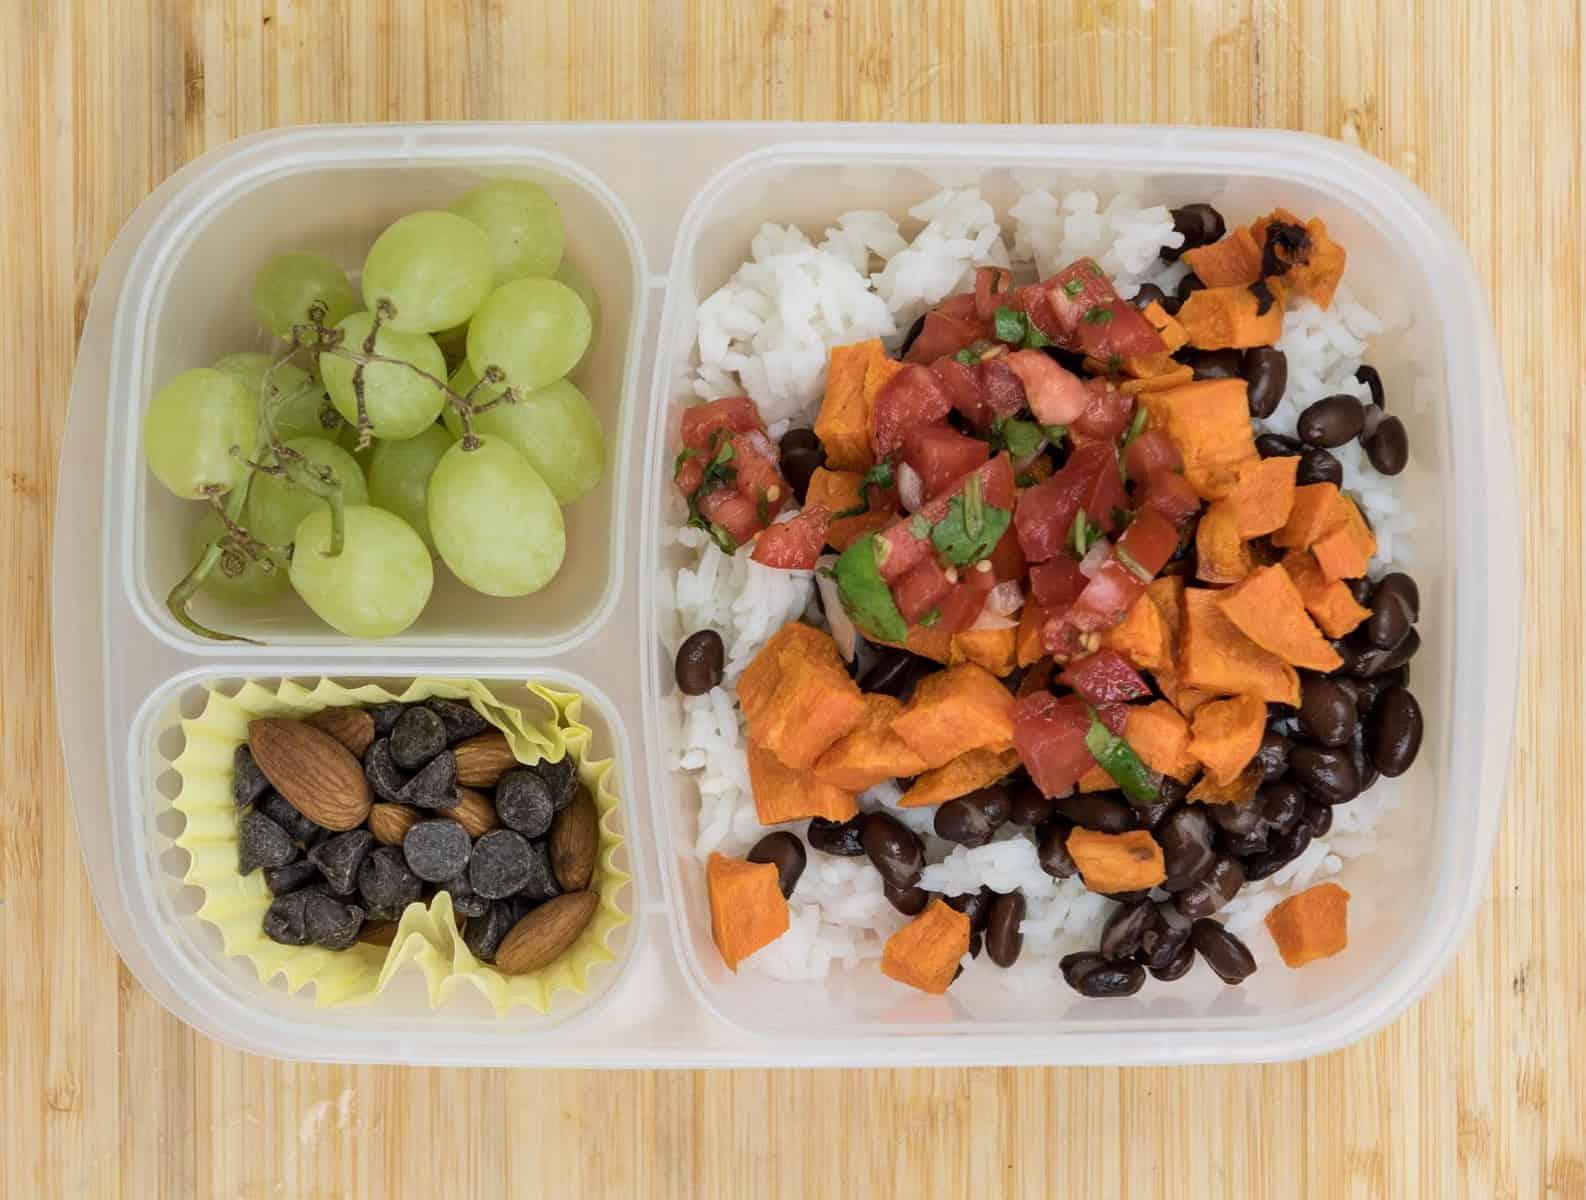 Lunch Box Ideas - Burrito Bowl Lunch Box